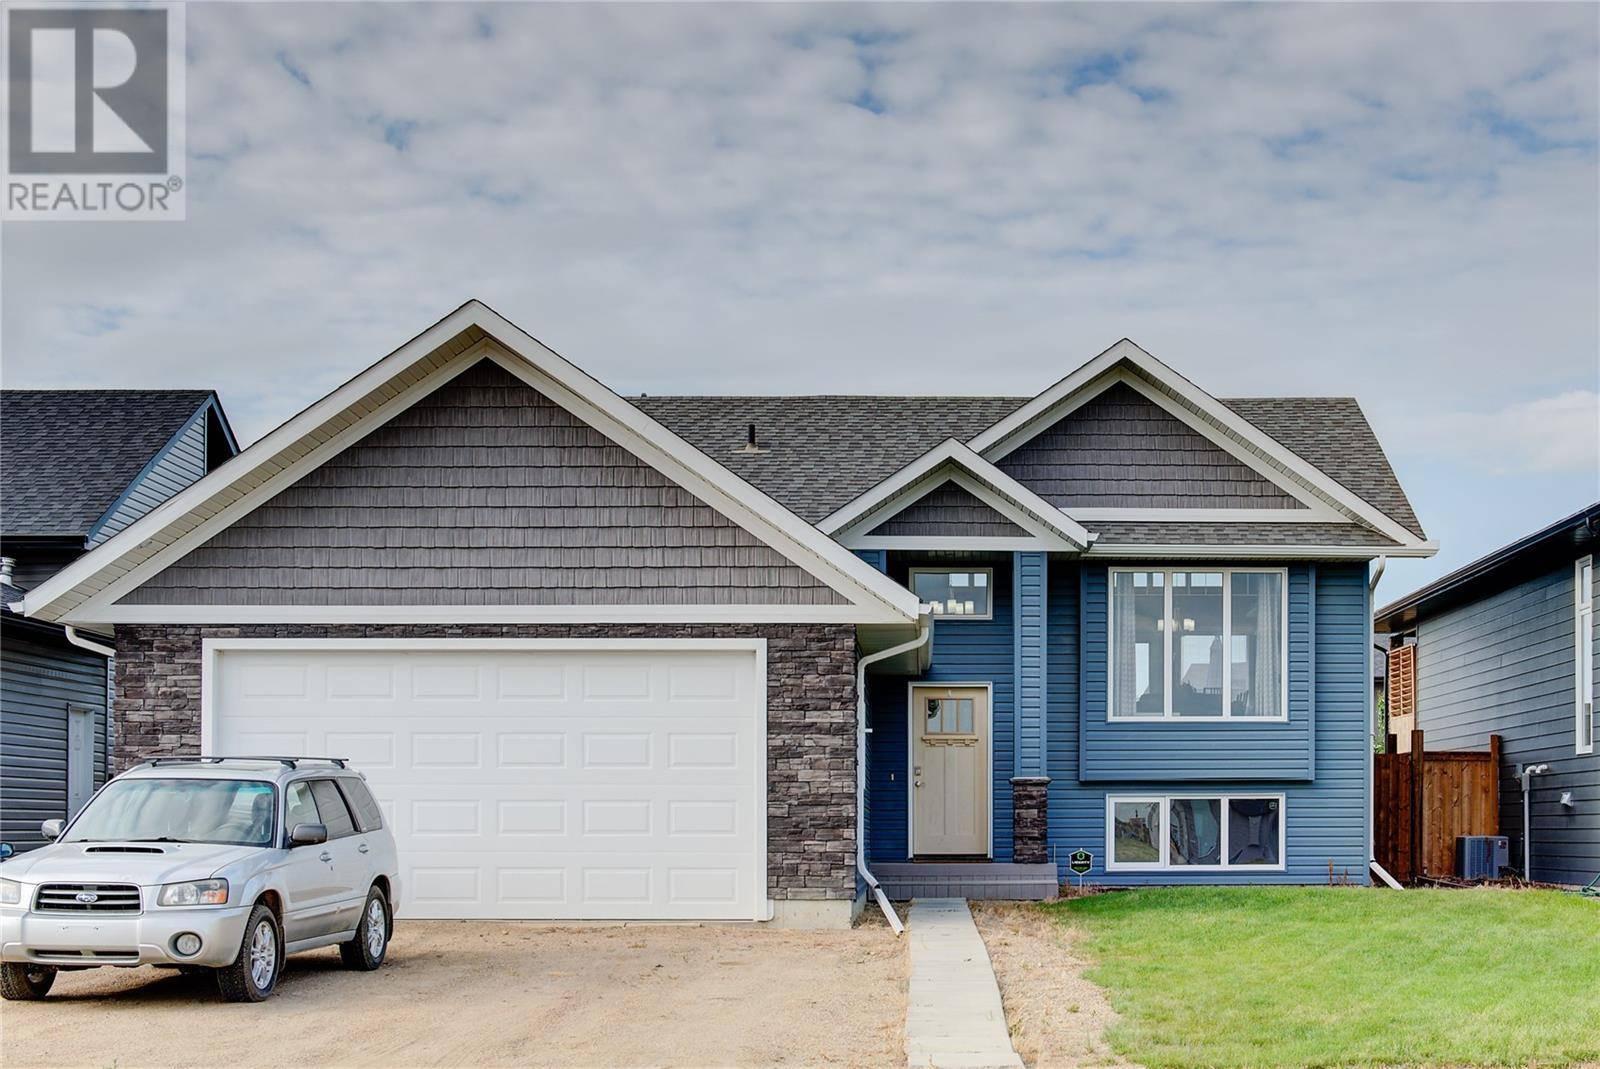 House for sale at 612 Pebble Beach Blvd Warman Saskatchewan - MLS: SK783227